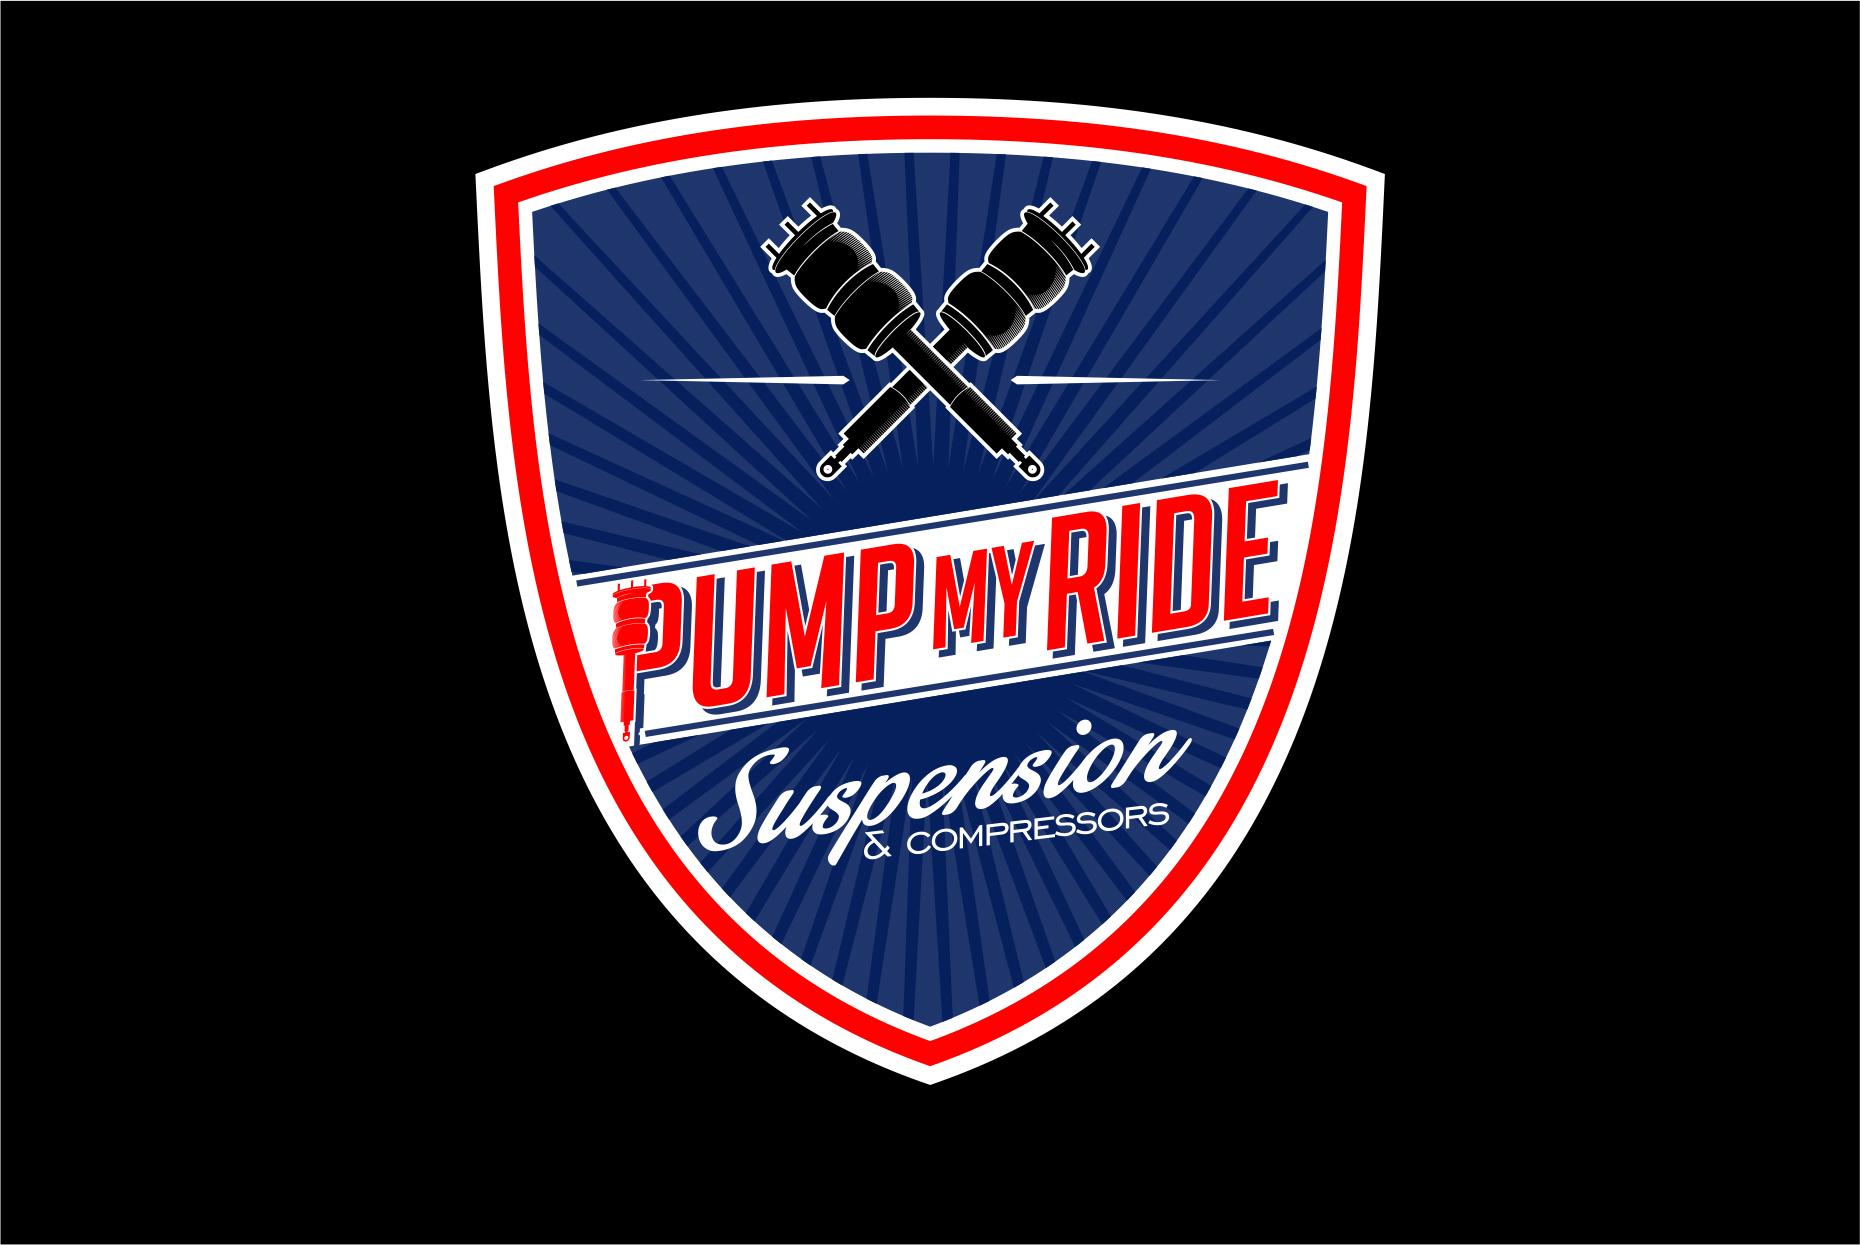 PUMP MY RIDE Suspension & COMPRESSORS